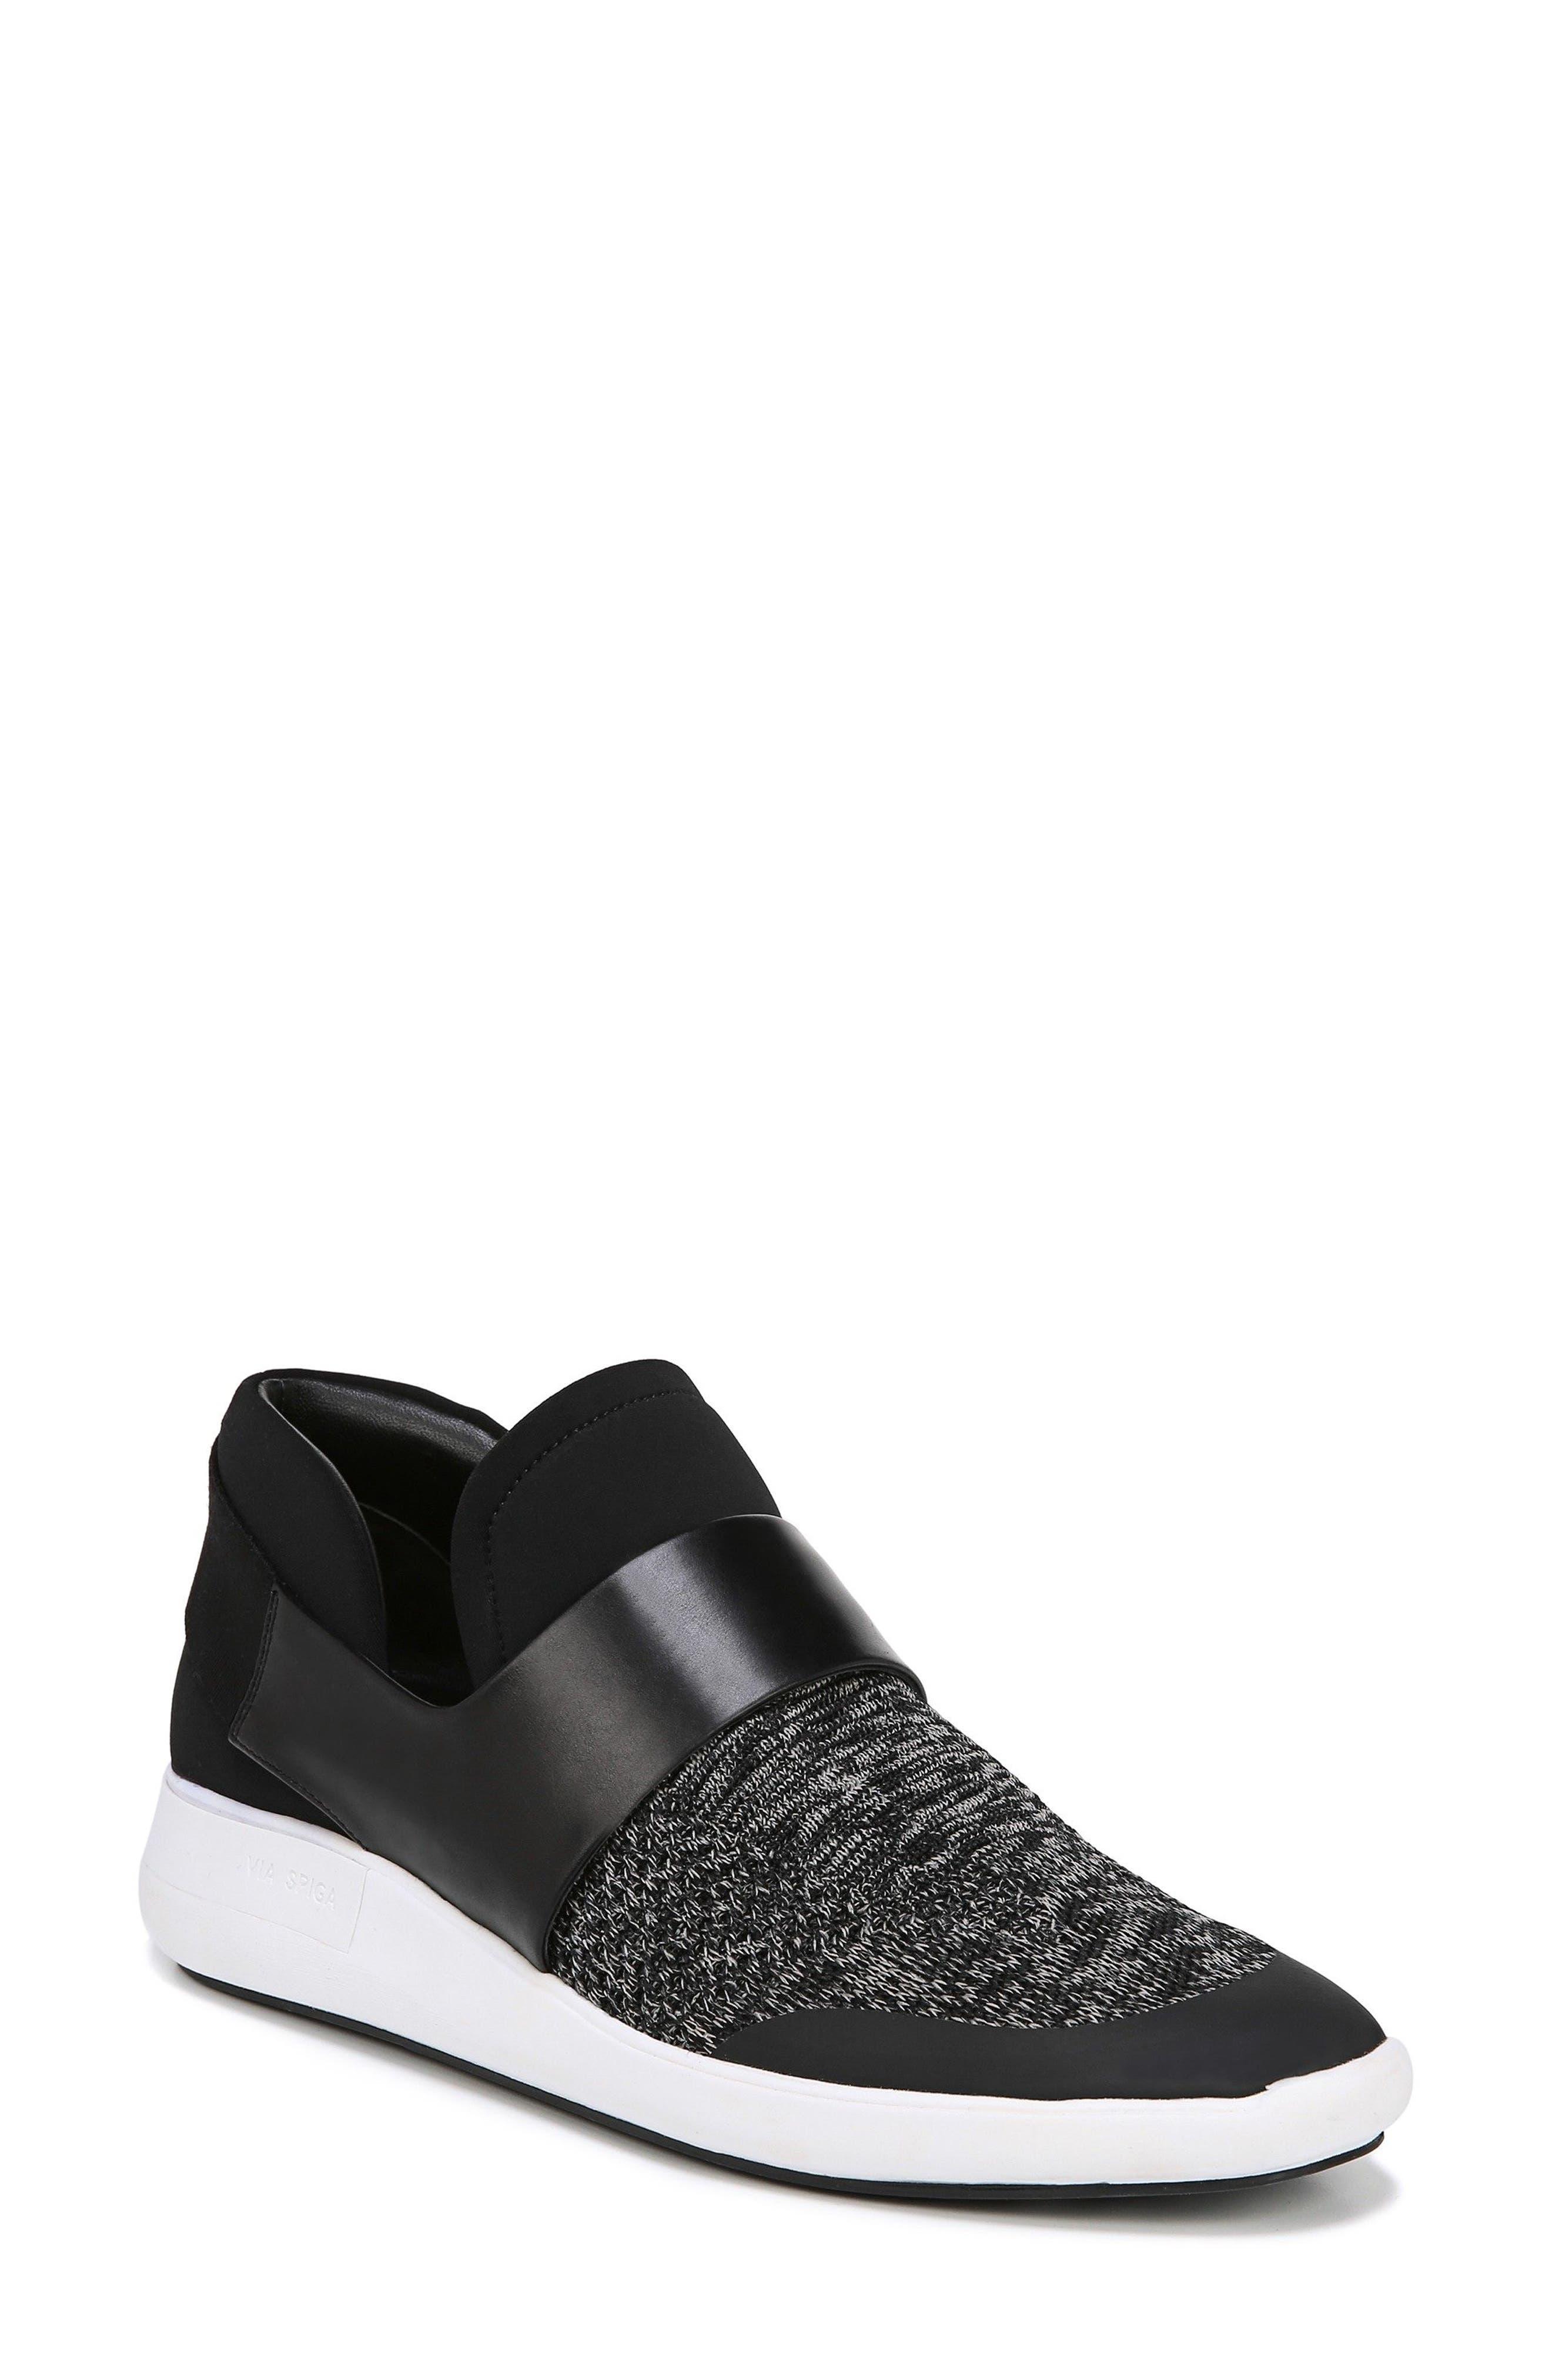 Via Spiga | Misha Slip-On Sneaker